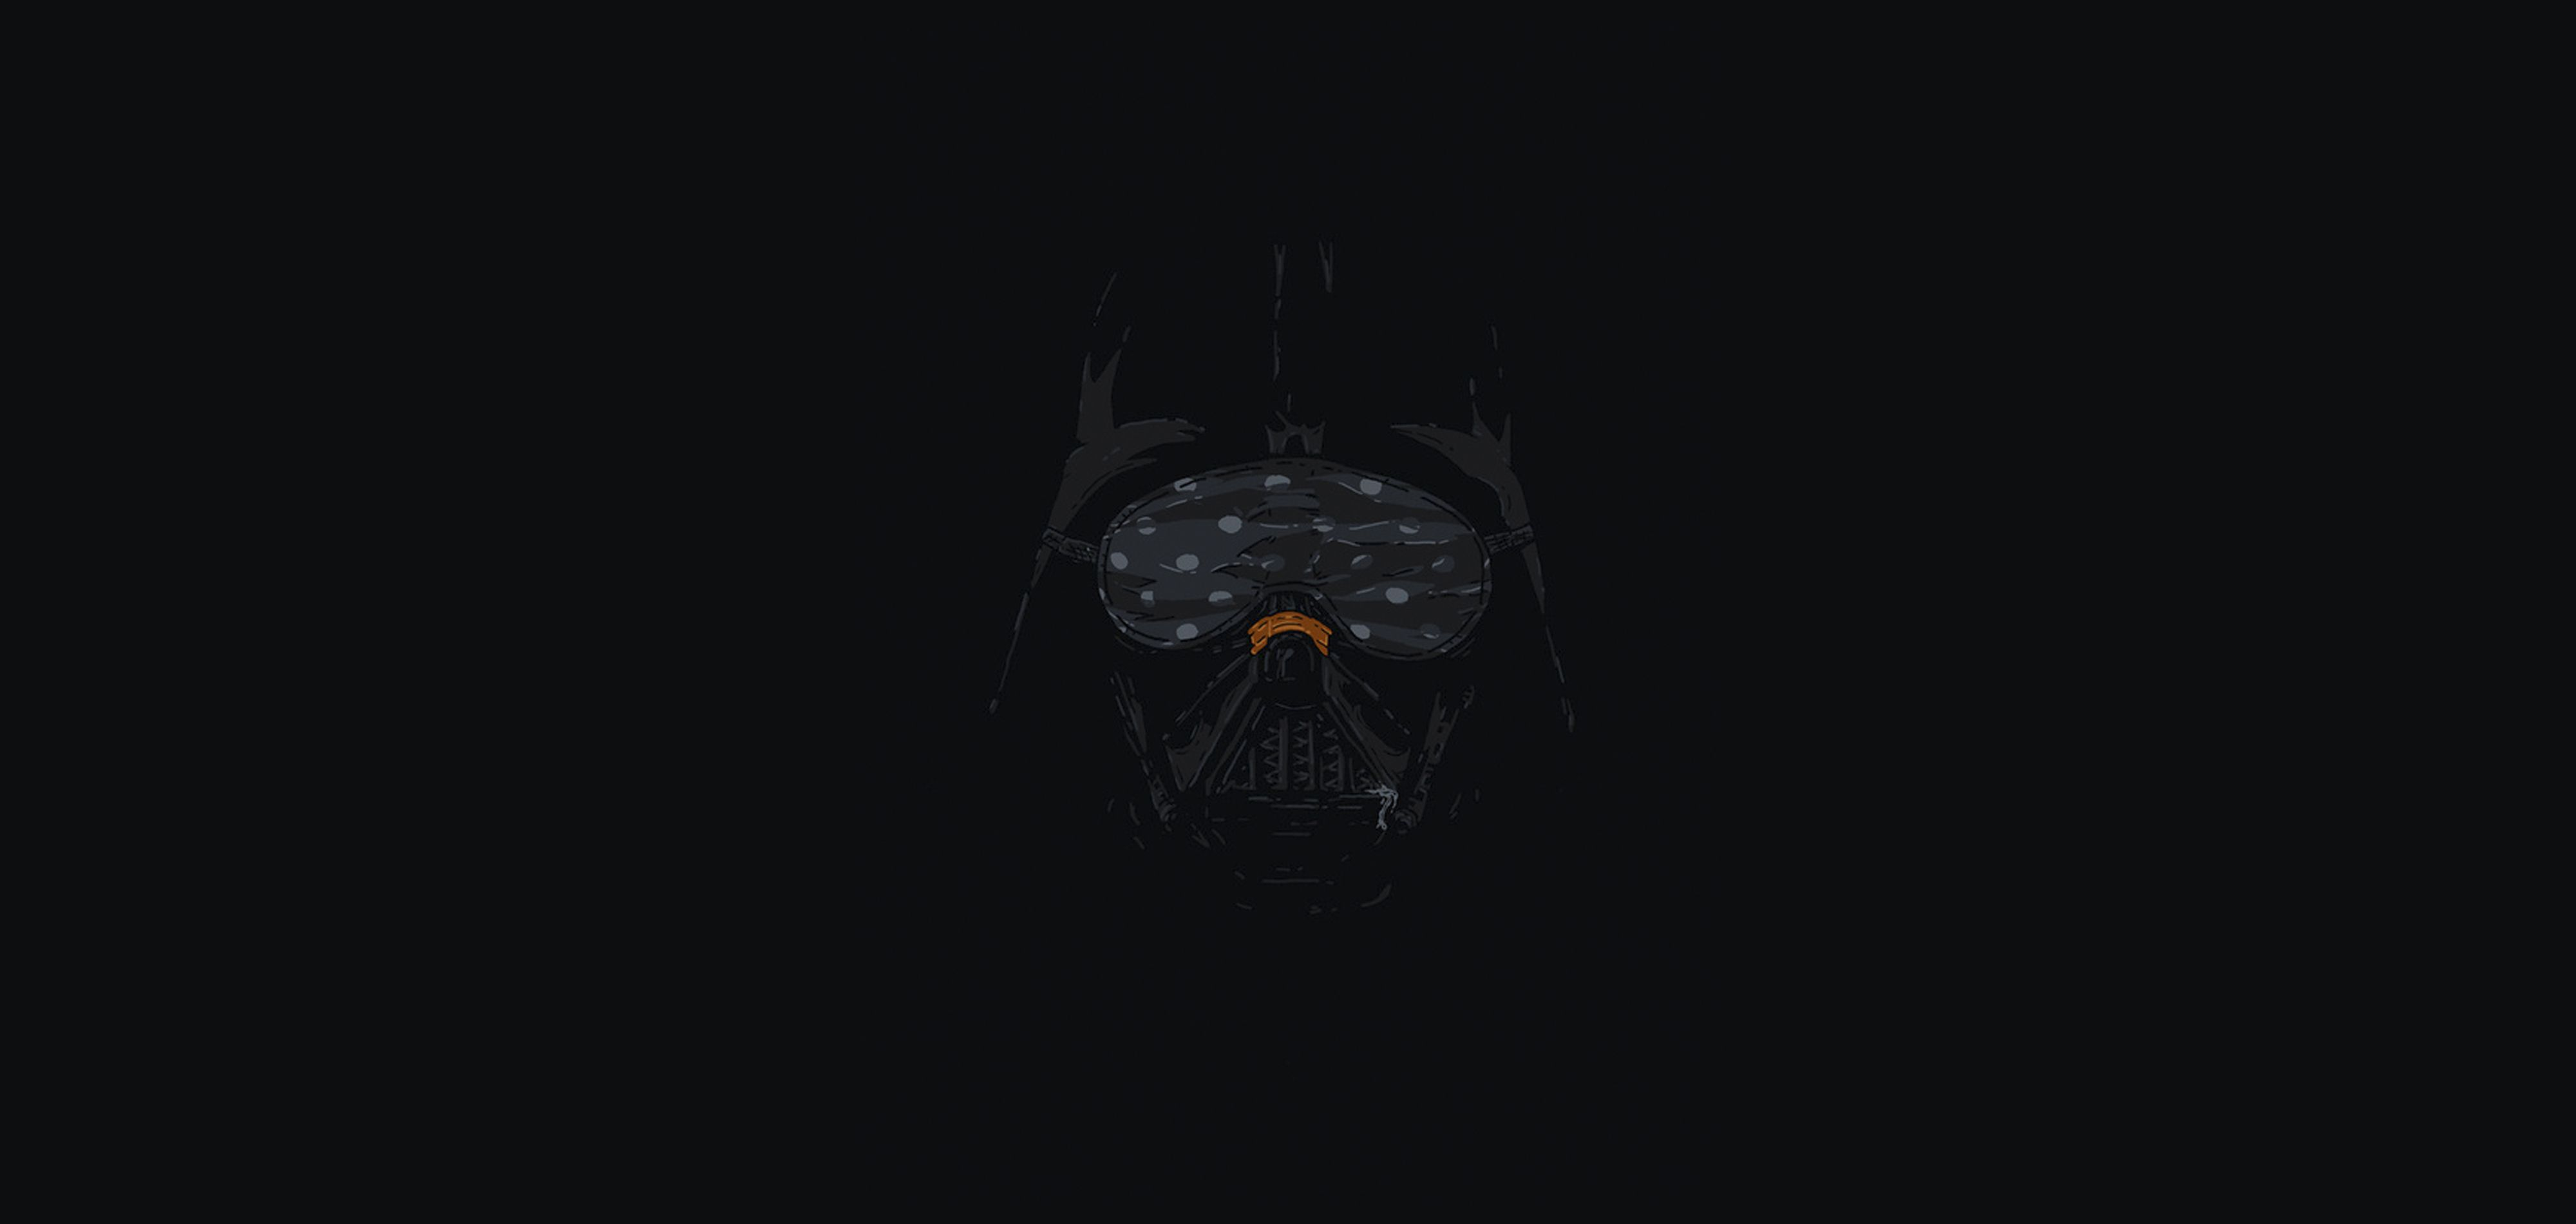 Star Wars Black Wallpapers On Wallpaperdog